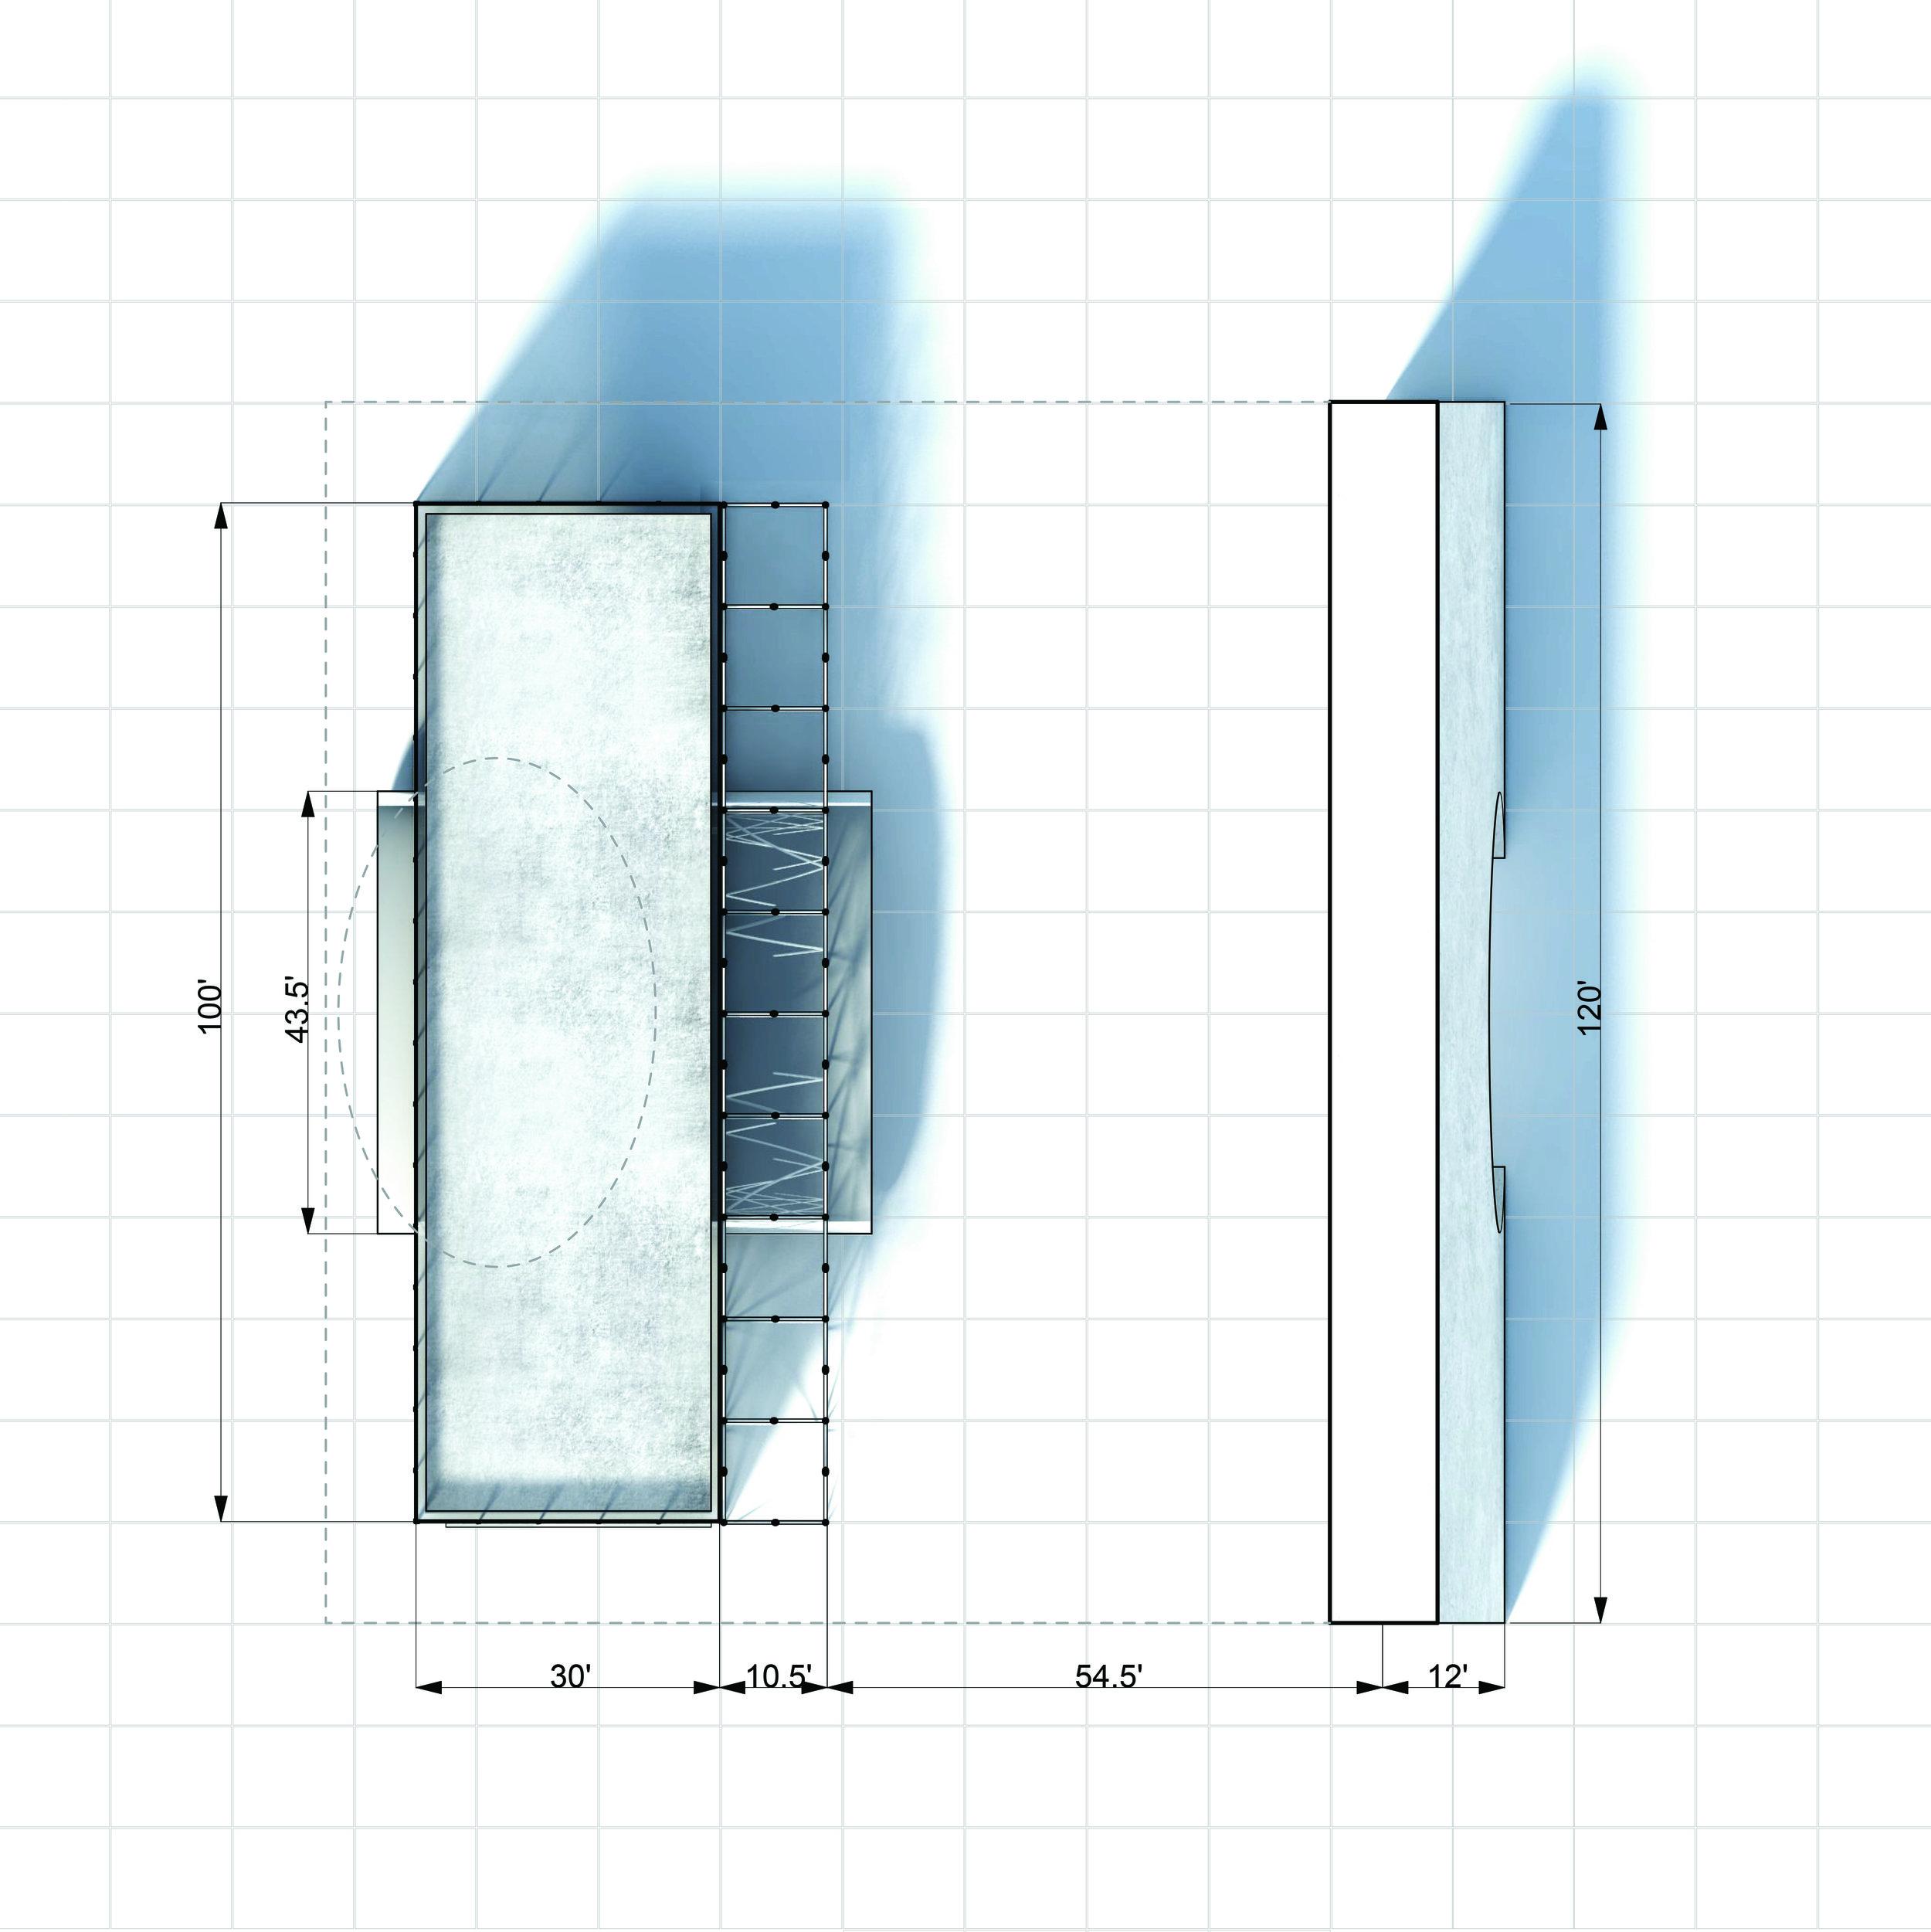 S.E.A.-Studio-Environmental-Architecture-David-Hertz-FAIA-Launch-Facility-Cape-Canaveral-Florida-sustainable-regenerative-restorative-green-design-Spacex-rocket-spaceship-astronaut-cosmos-space-exploration-cosmic-interstellar-tower-cool-roof-plan.jpg